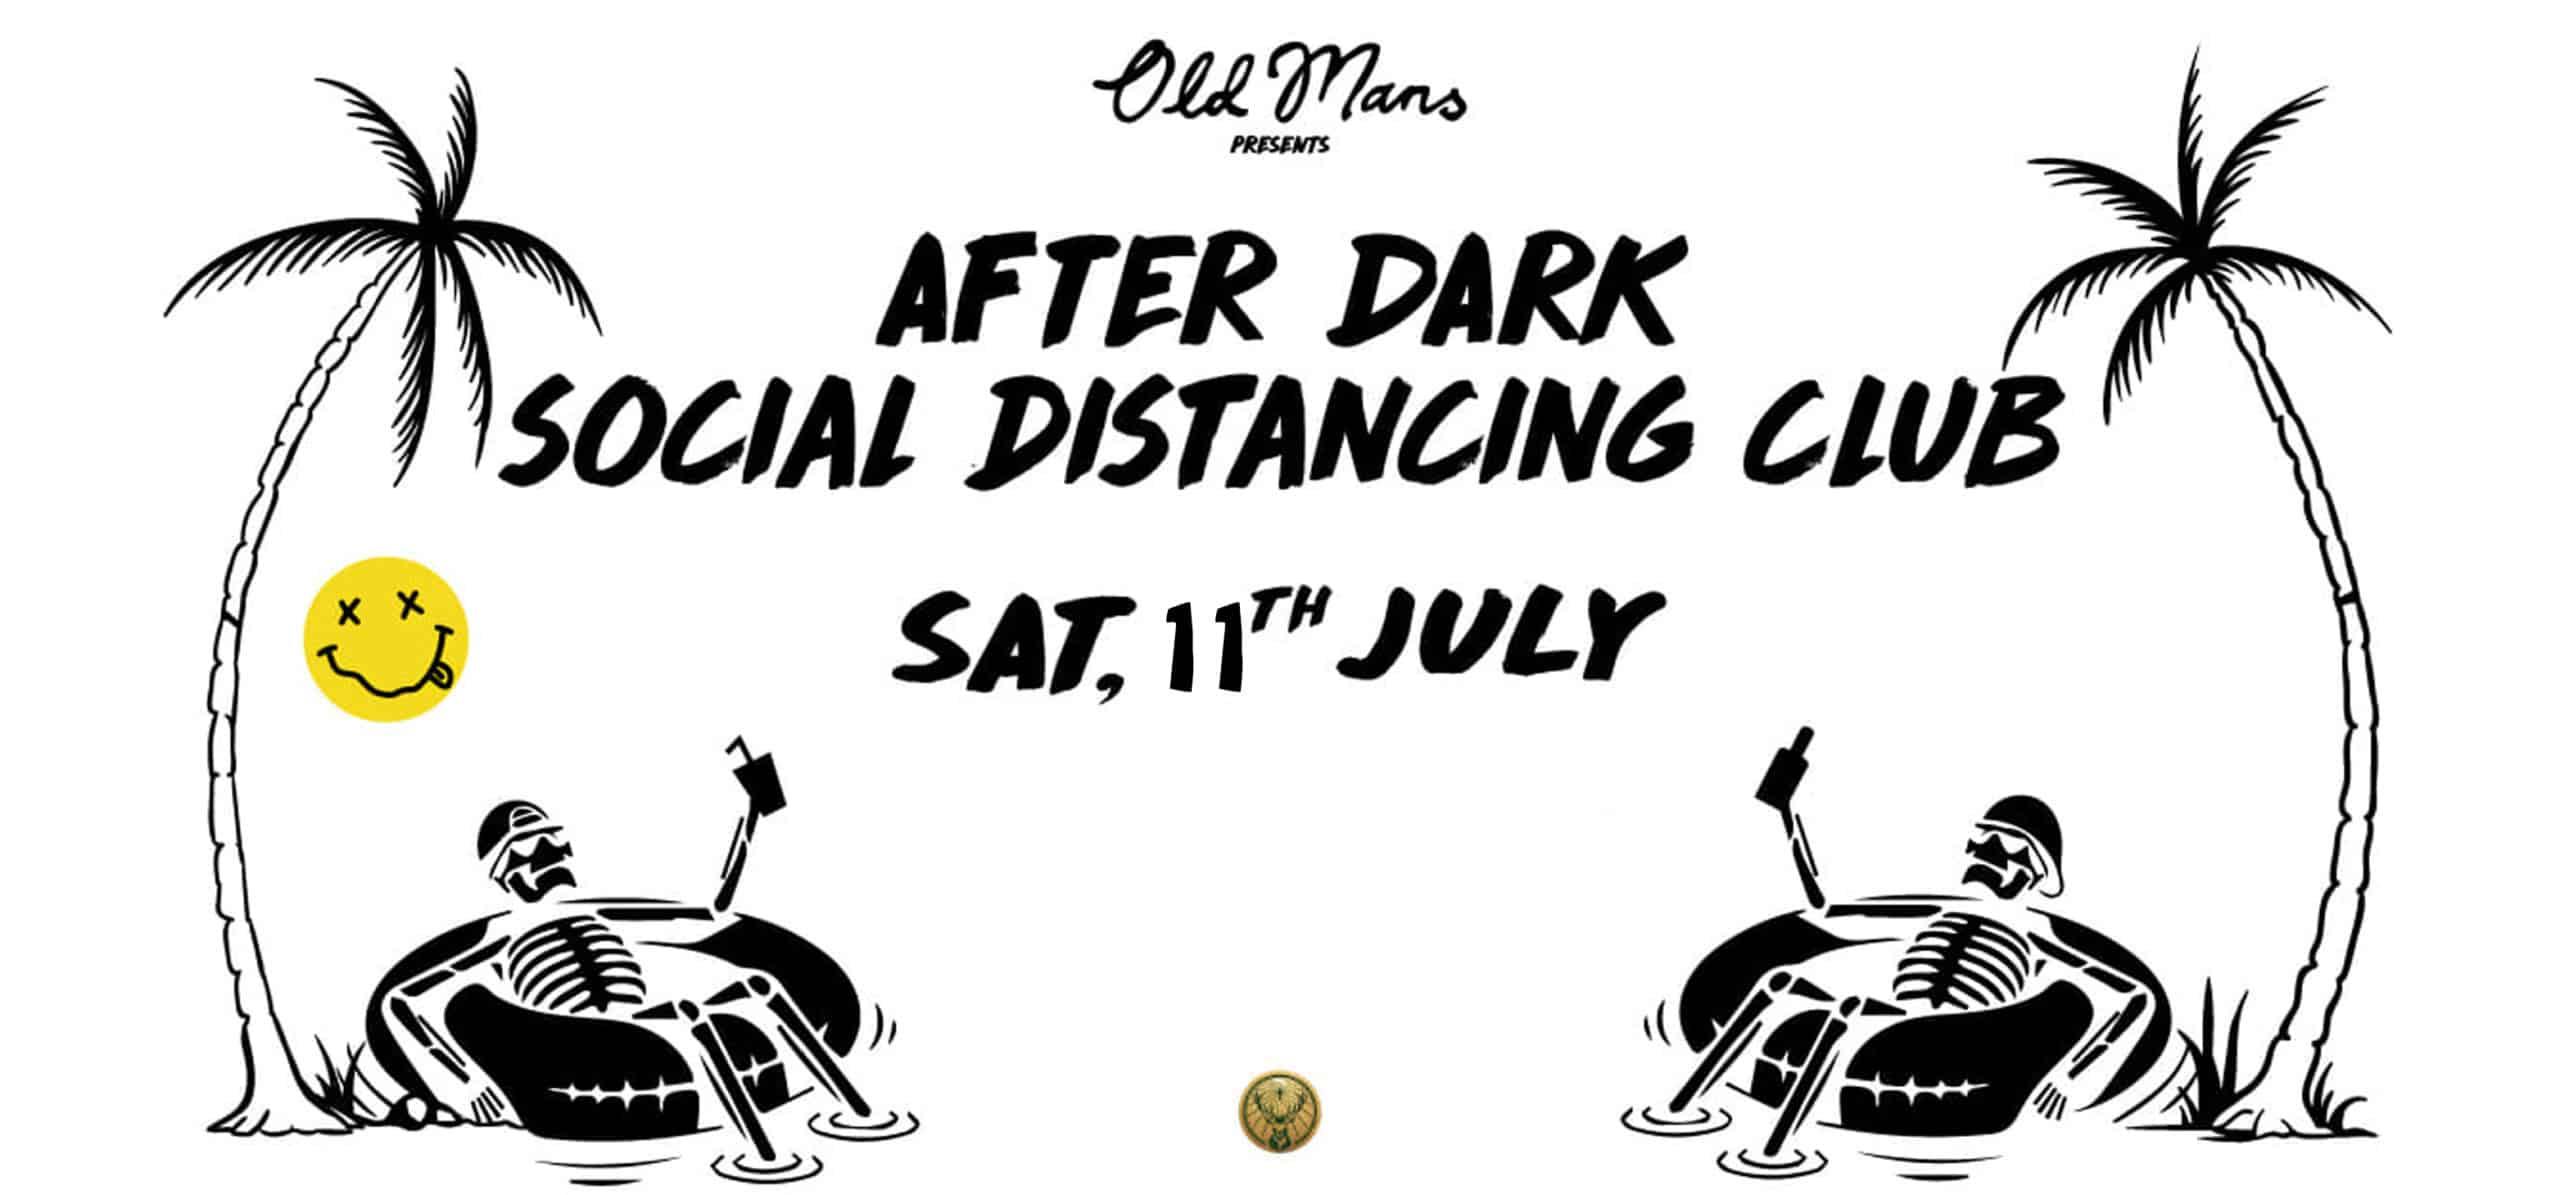 AFTER DARK SOCIAL DISTANCING CLUB